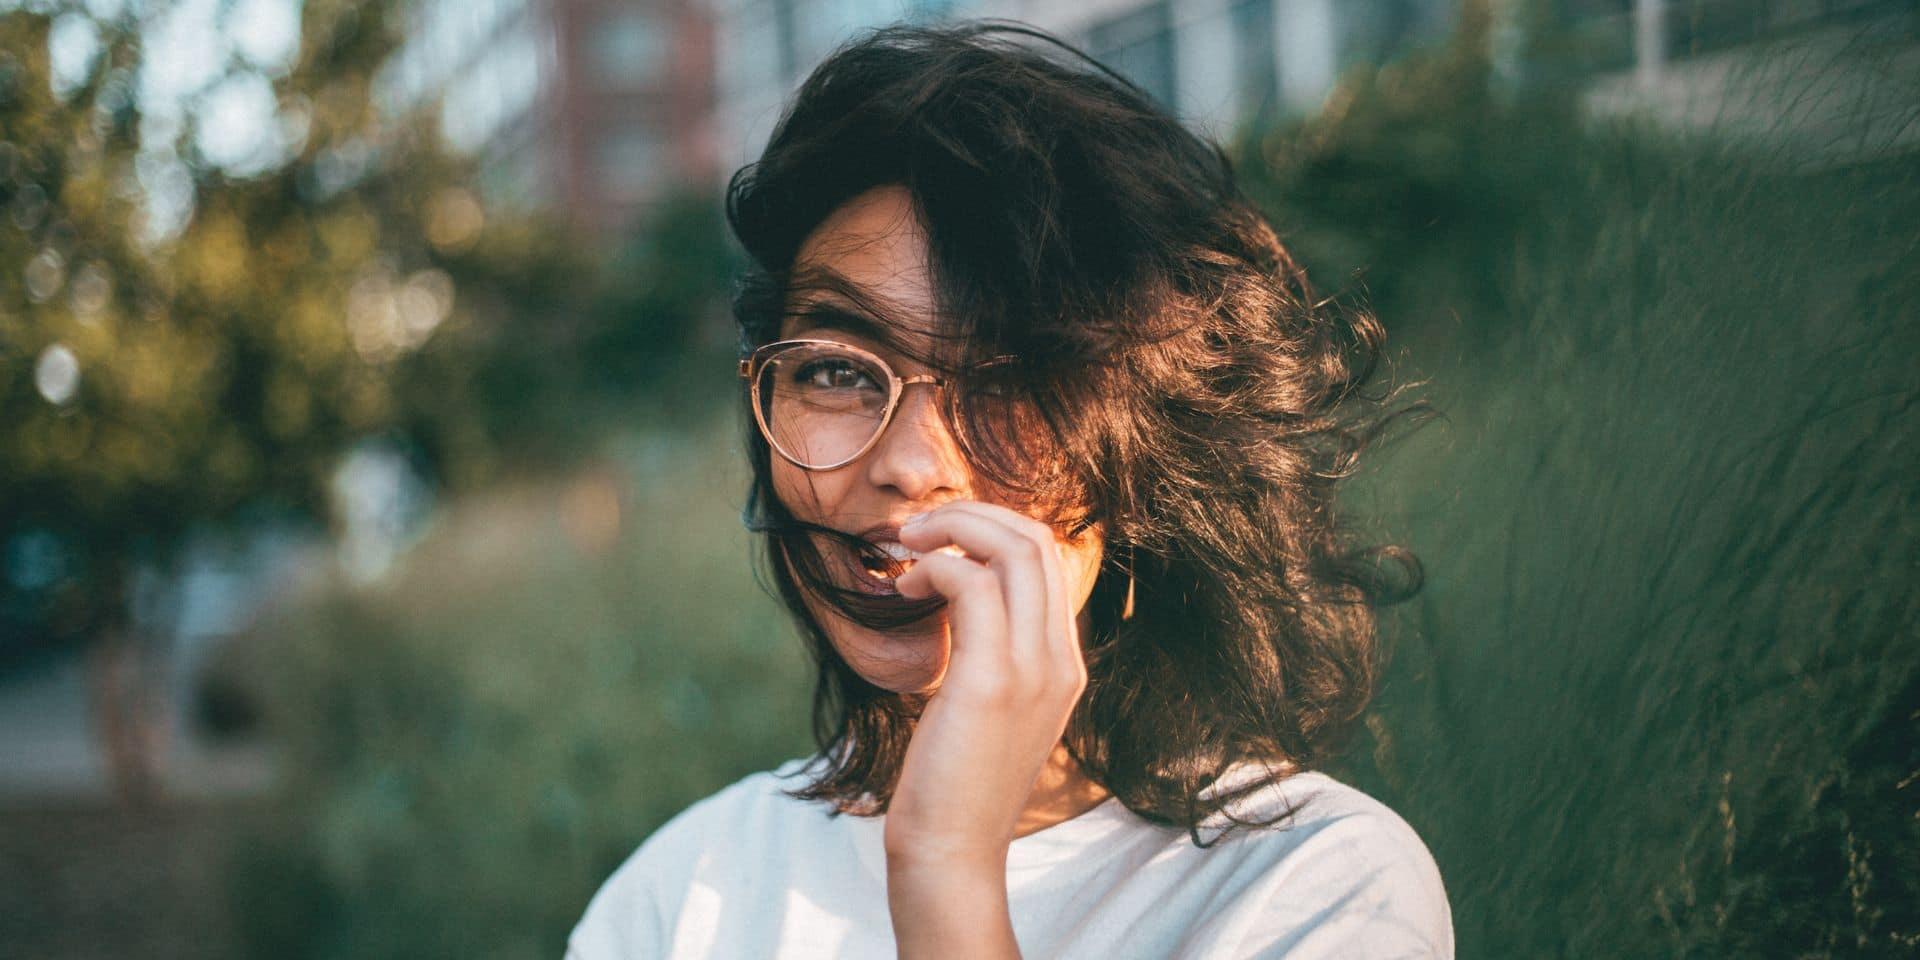 Femme HP : entre hypersensibilité et intelligence